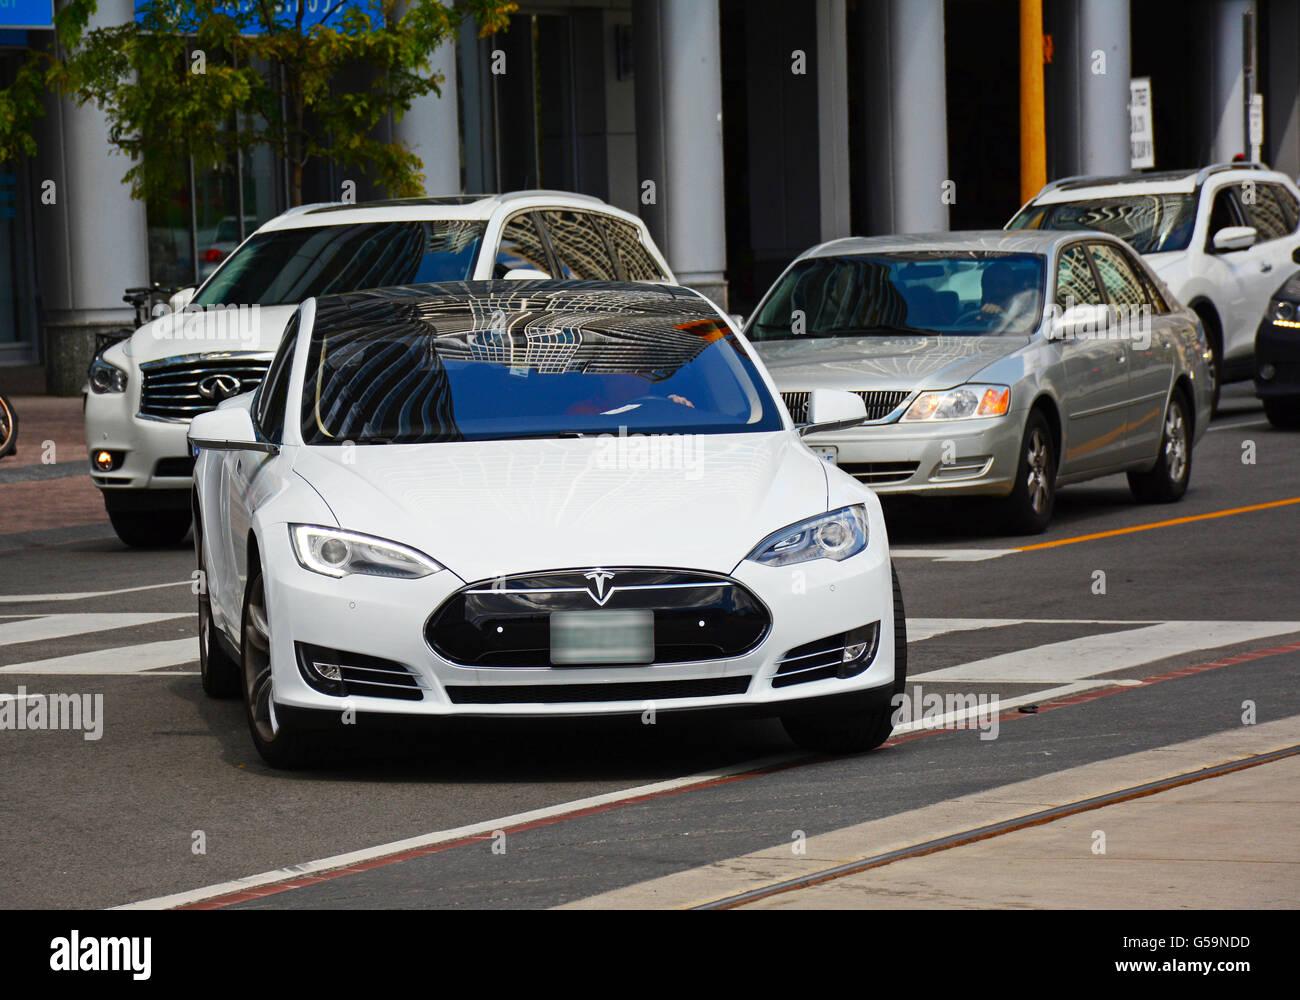 Tesla, Electric car in Toronto streets, Canada - Stock Image